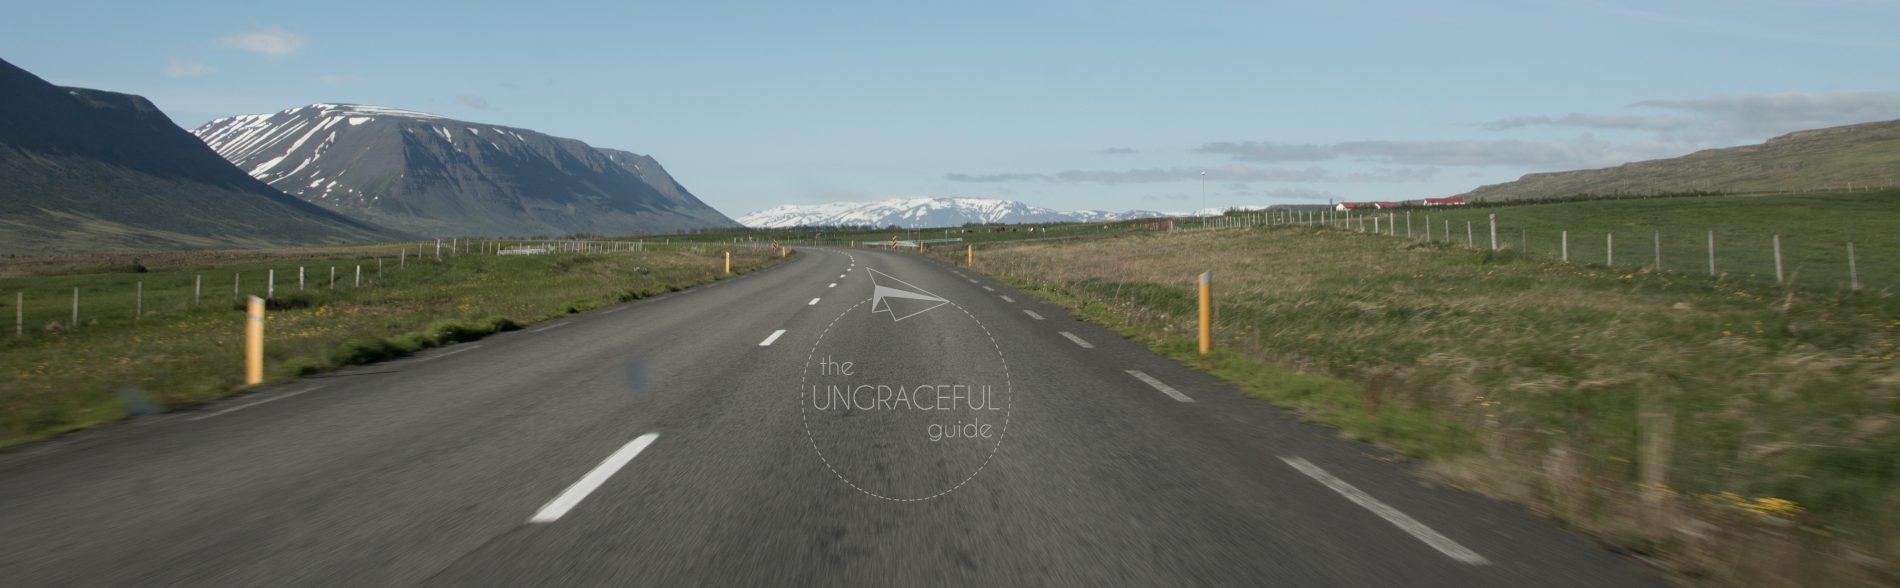 "<img src=""data:image/gif;base64,R0lGODdhAQABAPAAAP///wAAACwAAAAAAQABAEACAkQBADs="" data-lazy-src=""images/"" width=""800"" height=""600"" alt=""iceland - driving 1 - Iceland: How to get the most on a budget"">"